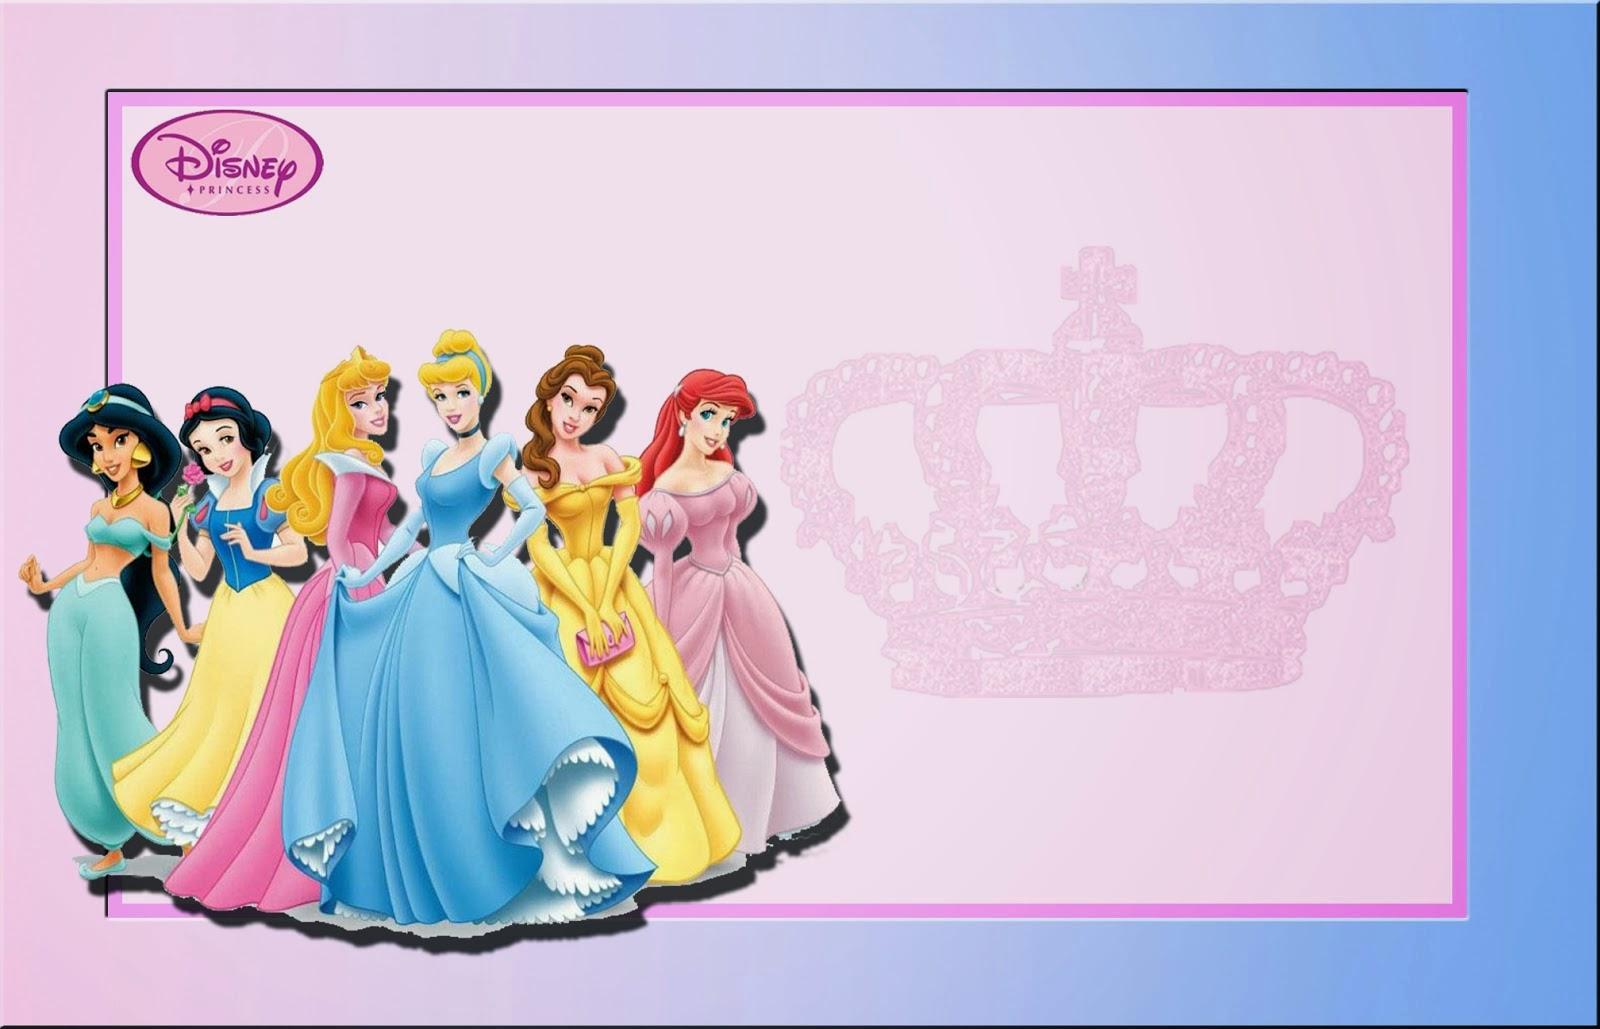 Disney Princess: Free Printable Invitations Or Photo Frames. | Oh My - Free Printable Princess Invitation Cards